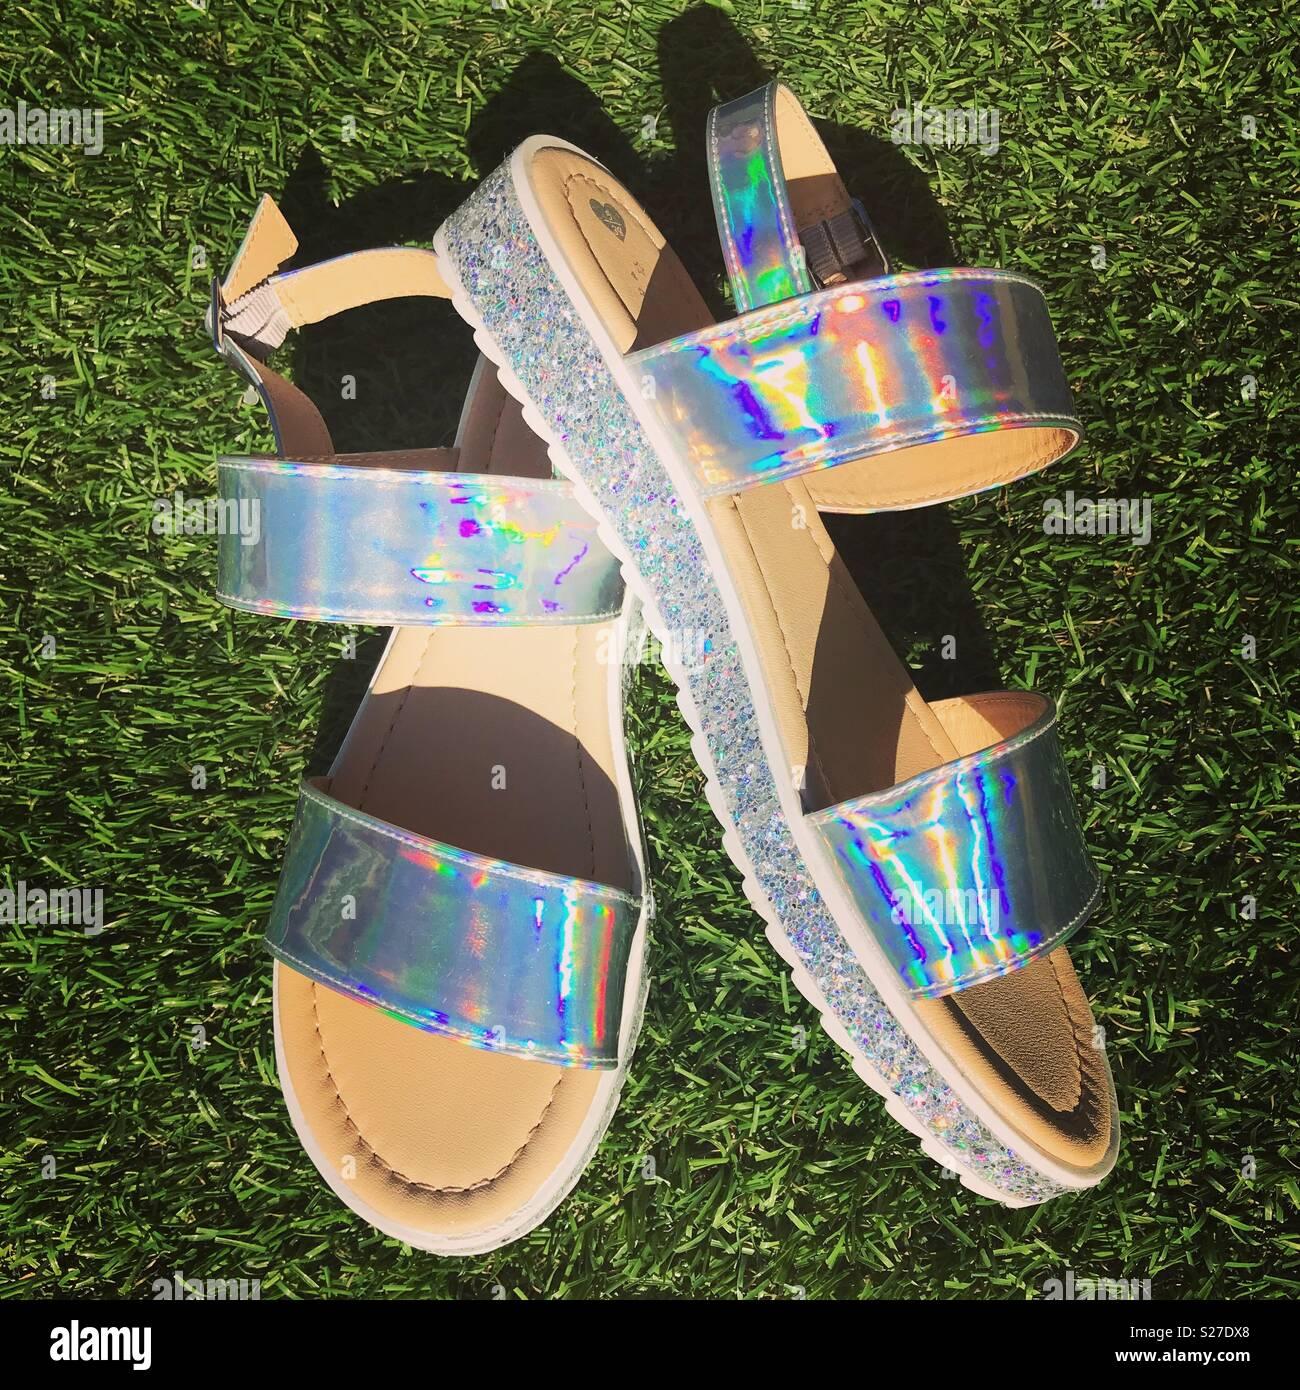 Holographic ladies sandals - Stock Image